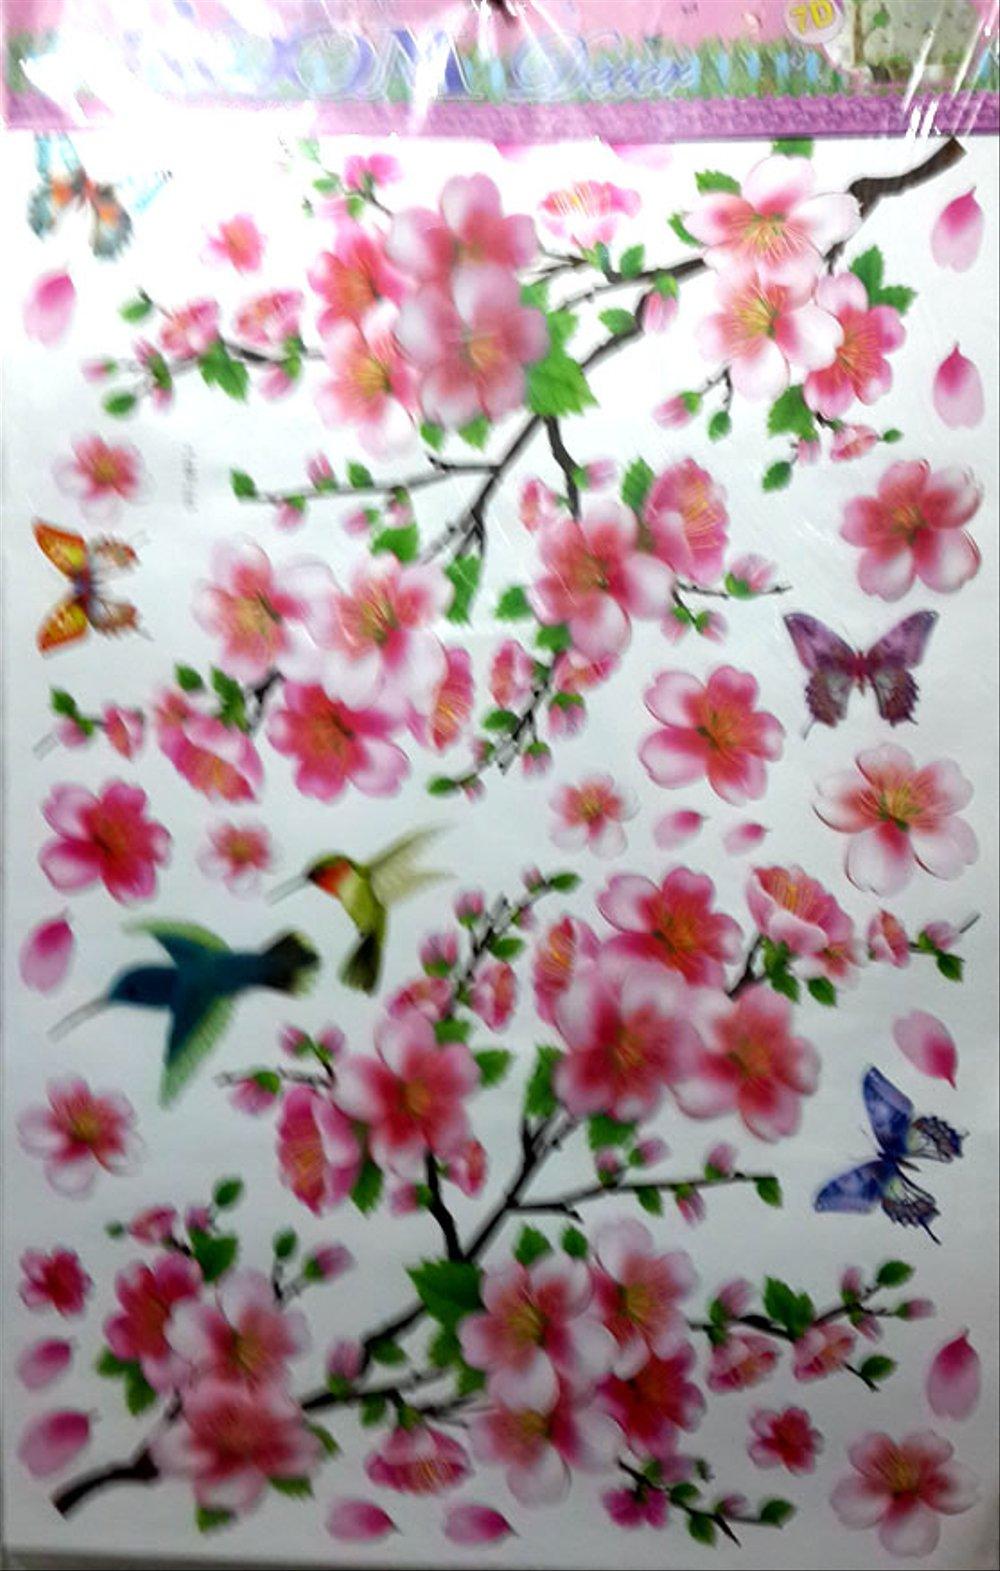 138 1389225 wallpaper 3d bunga sakura gambar dp bbm wall